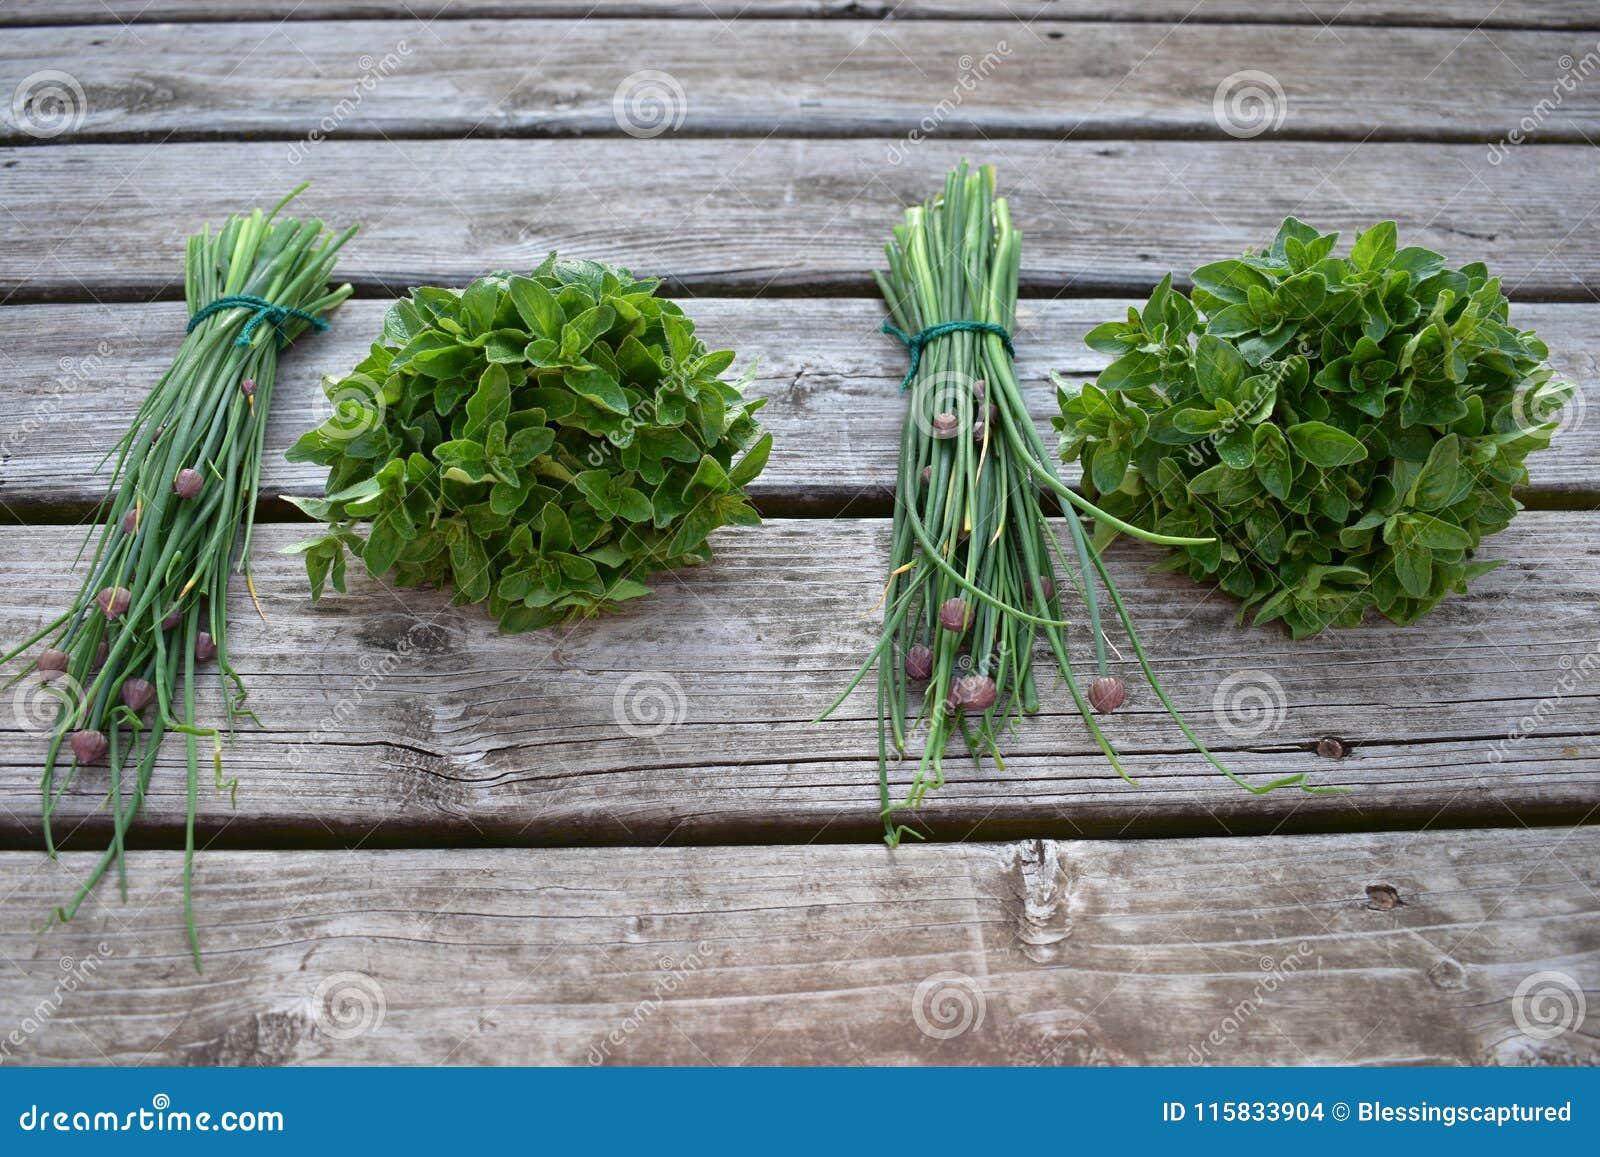 Herb bundles, chive and oregano